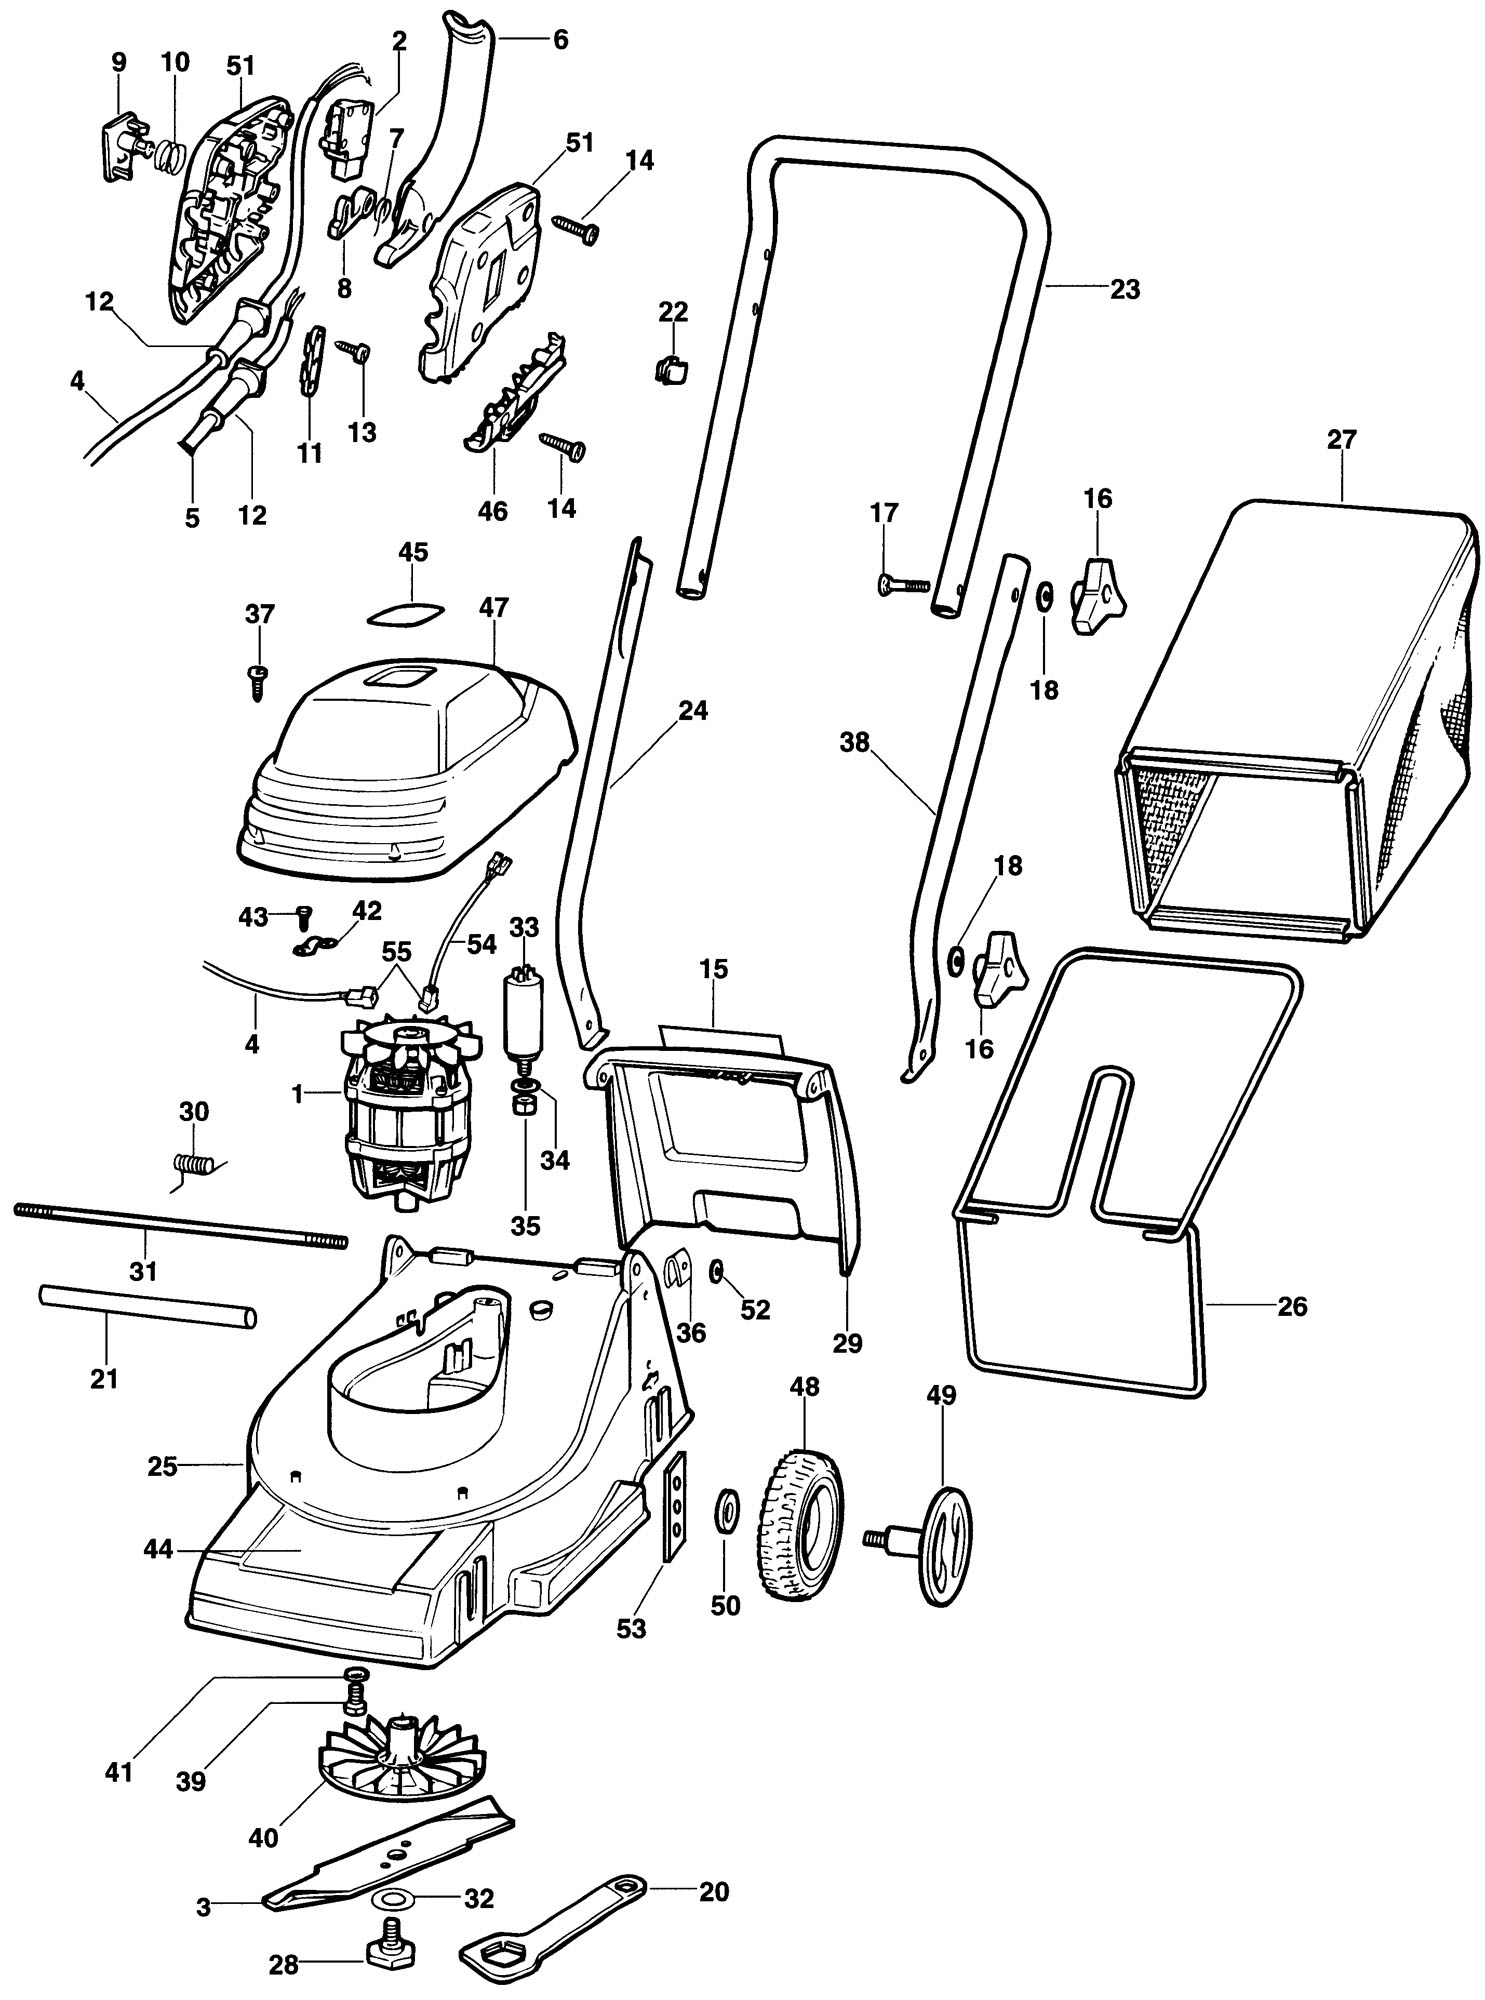 Spares for Black & Decker Gr230 Rotary Mower (type 1